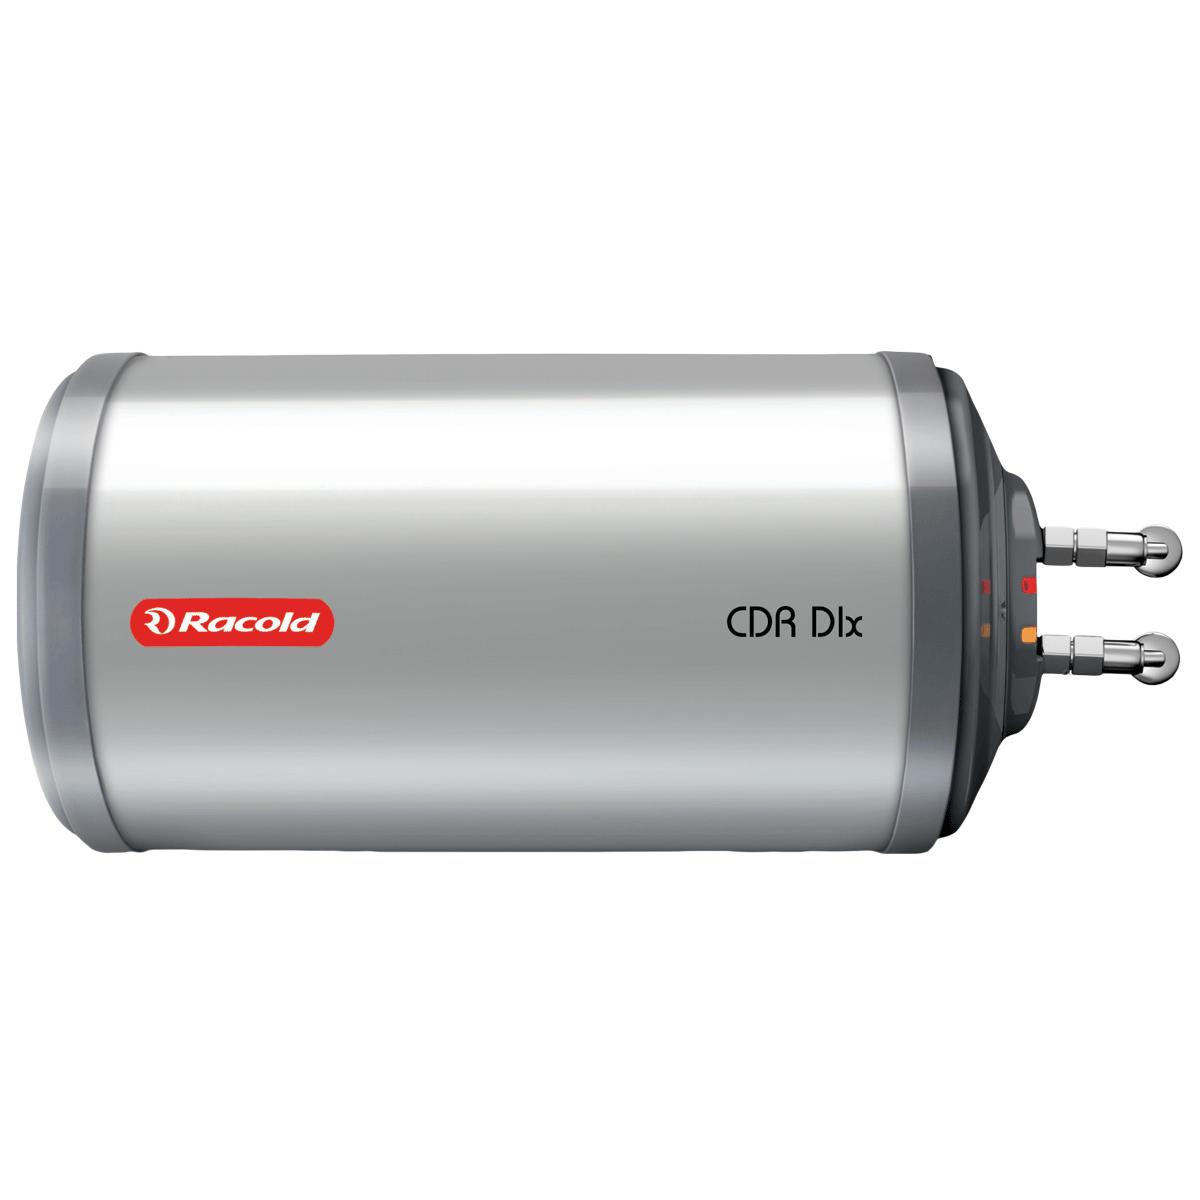 Racold CDR DLX 10 Litres 3 Star Storage Water Geyser (2000 Watts, LHS Water Inlet, White)_1